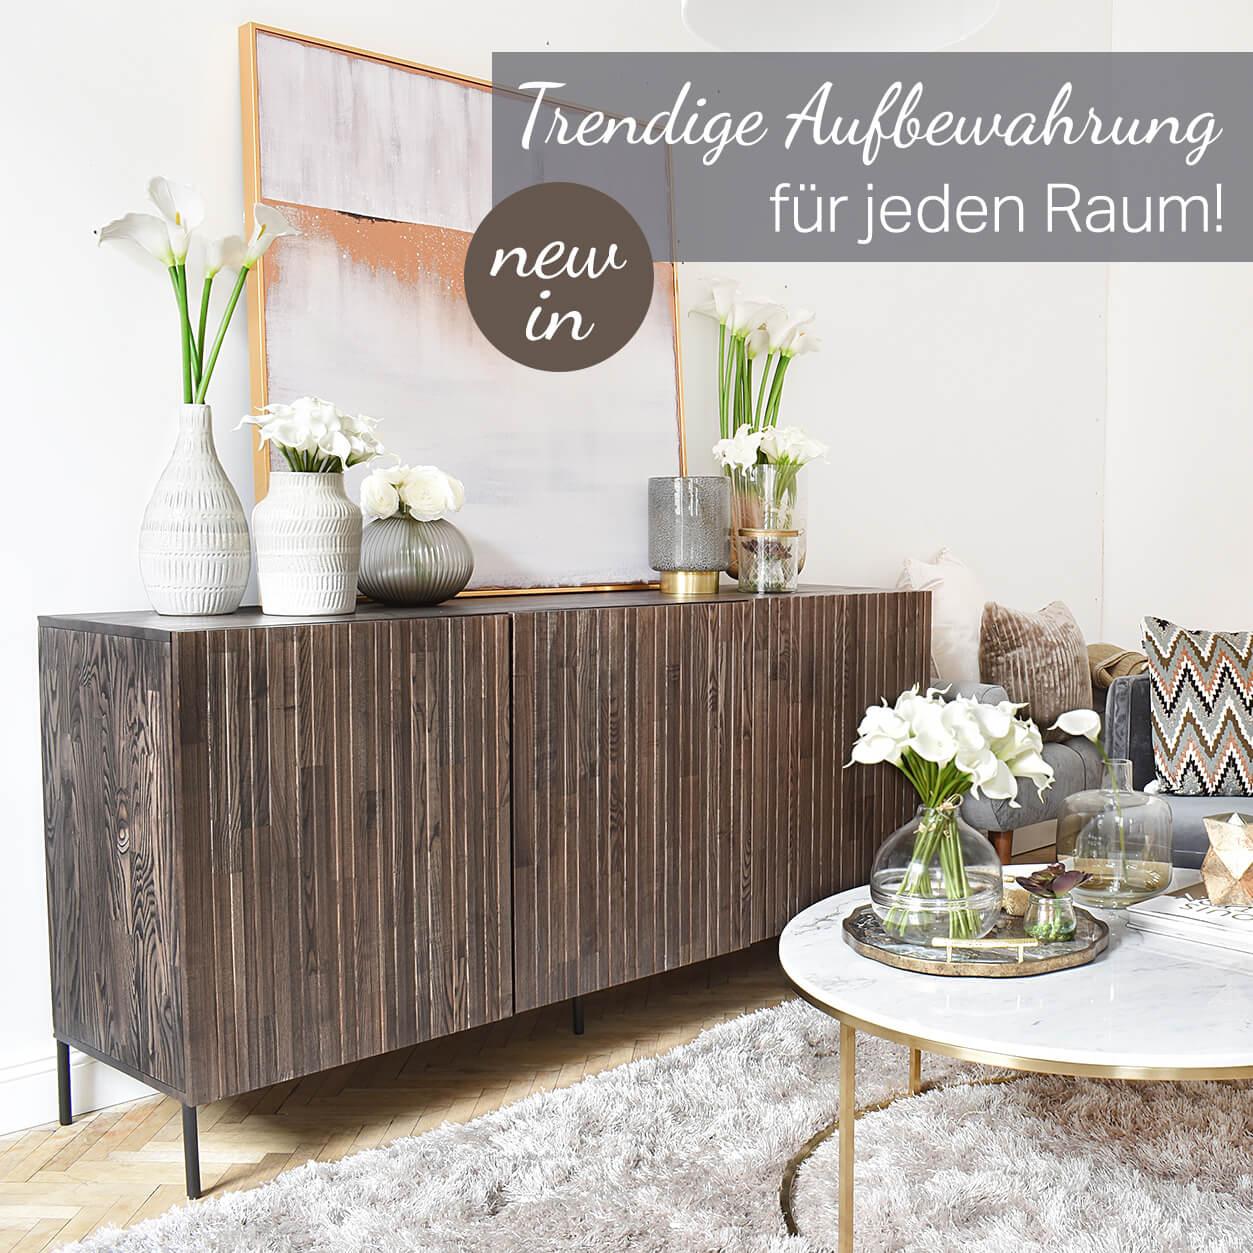 Sideboards, Bücherregale & Media-Lowboards: Trendige Aufbewahrungsmöbel!